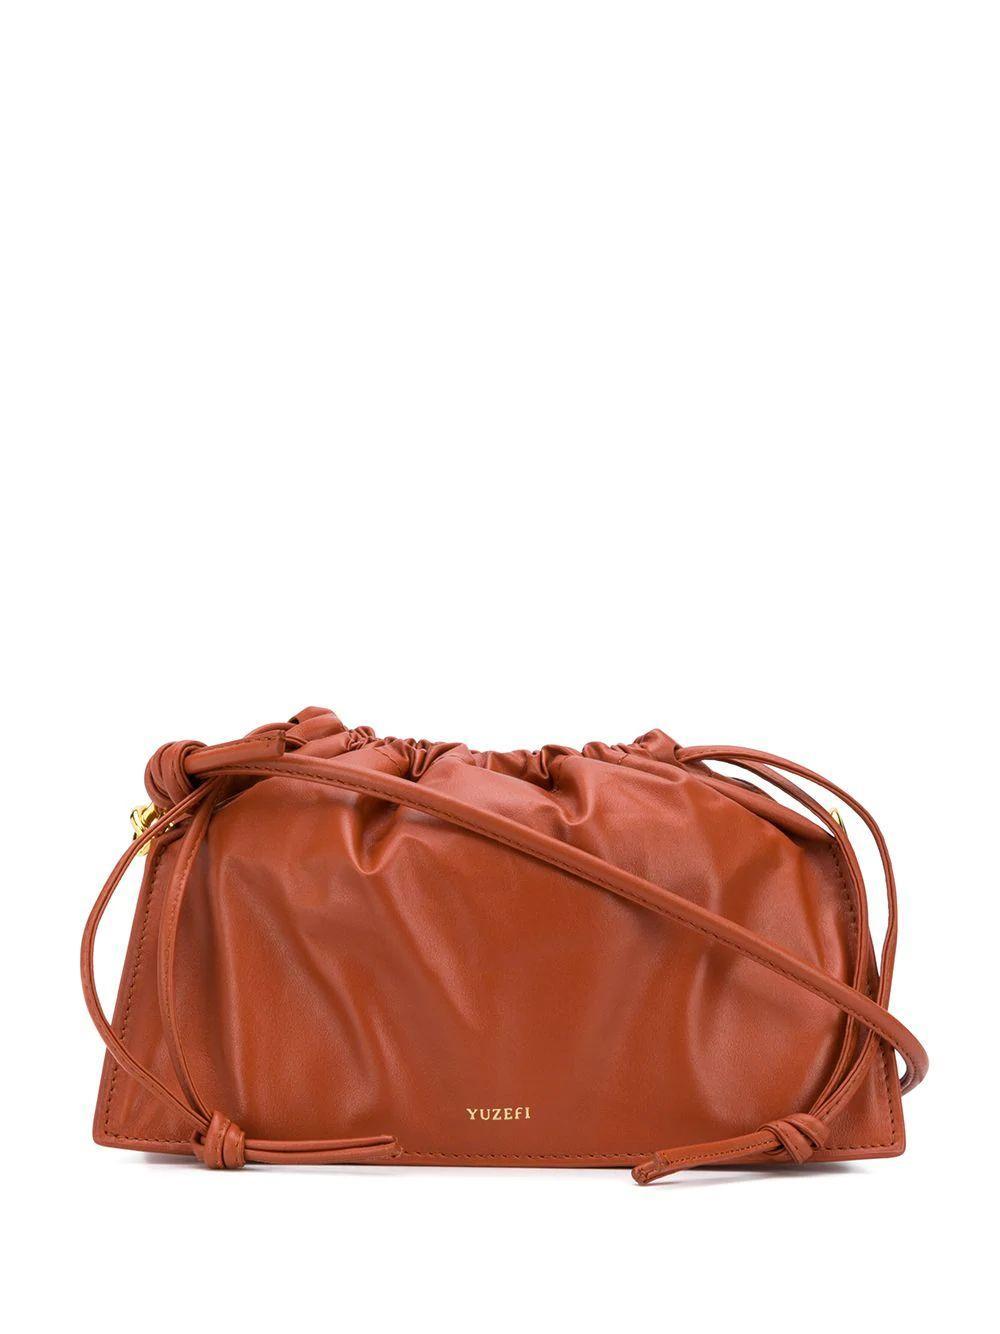 Bom Tote Bag Item # YUZPF20-BO-01